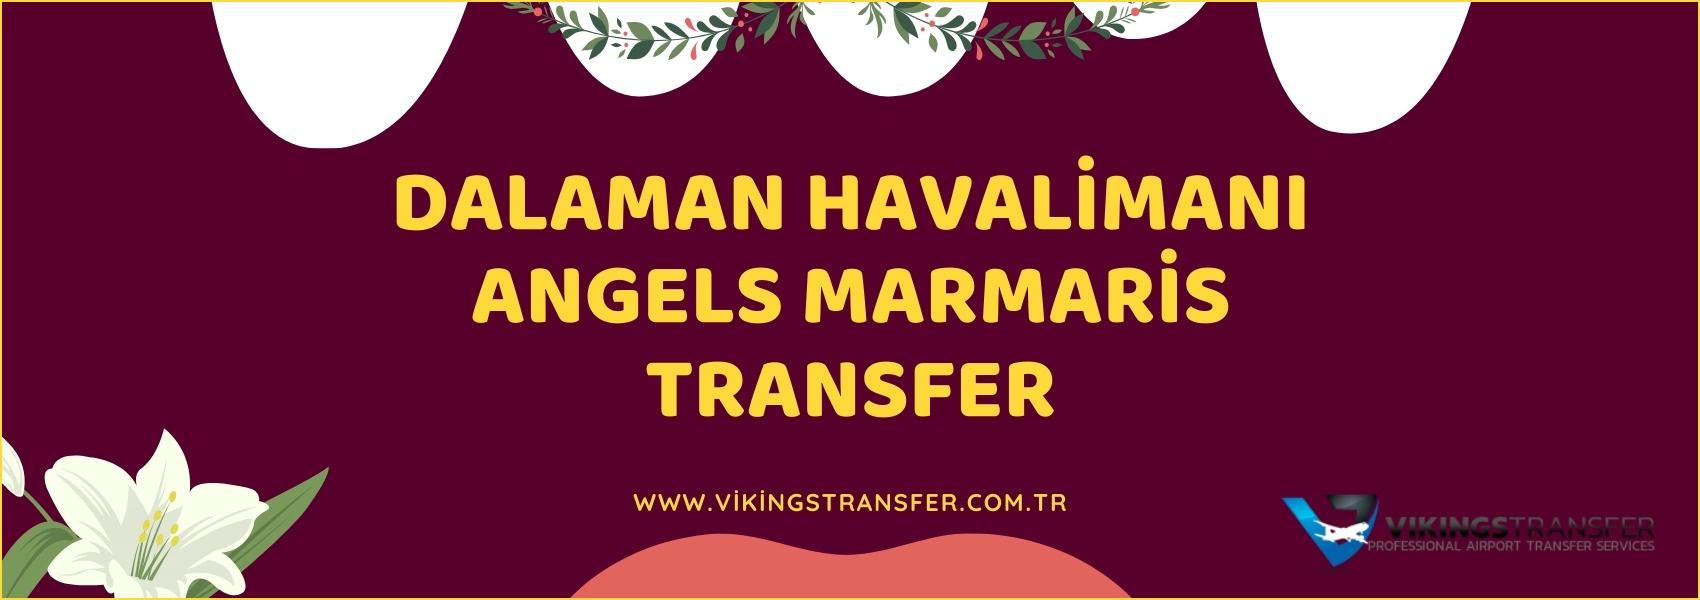 Dalaman havalimanı angels marmaris transfer